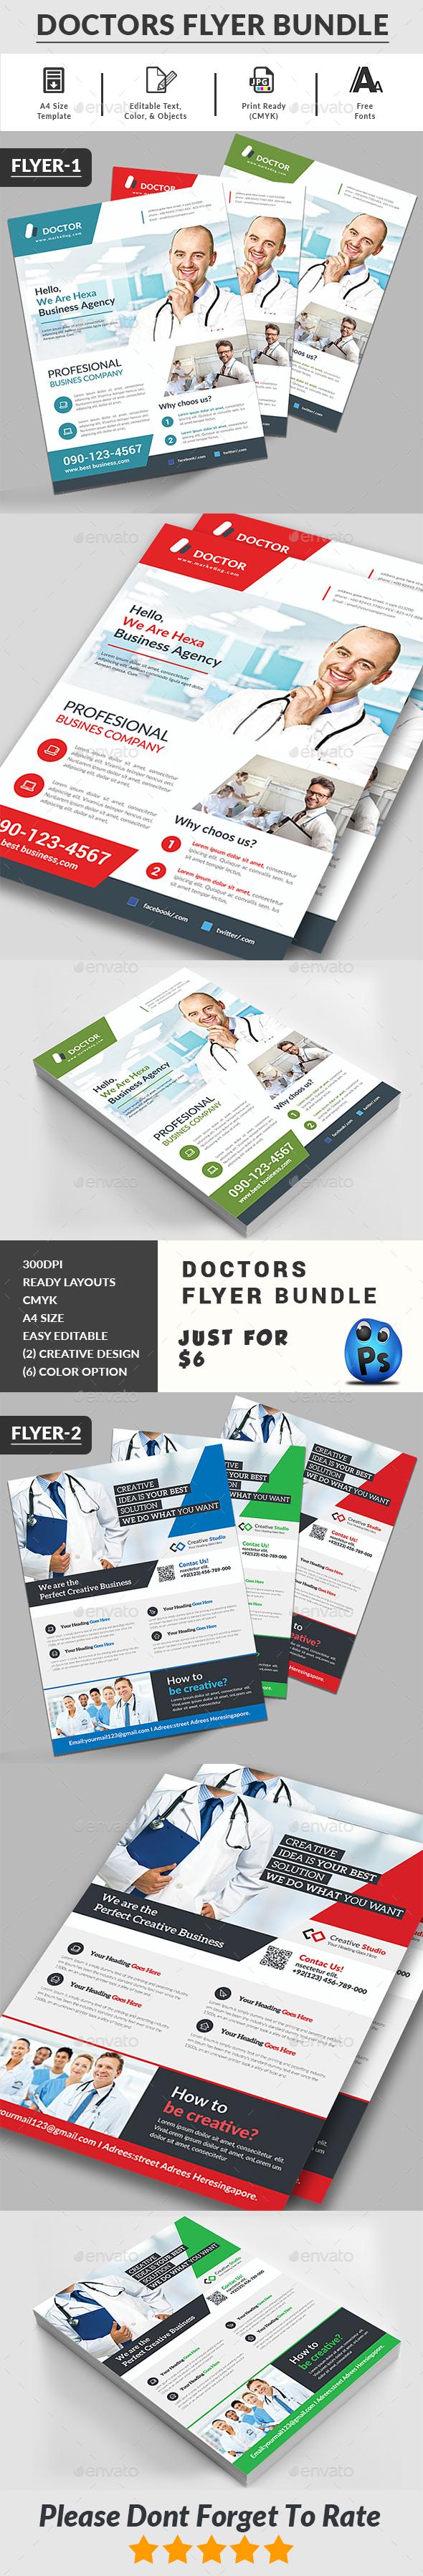 Doctors Flyers Bundle Templates - Corporate Flyers